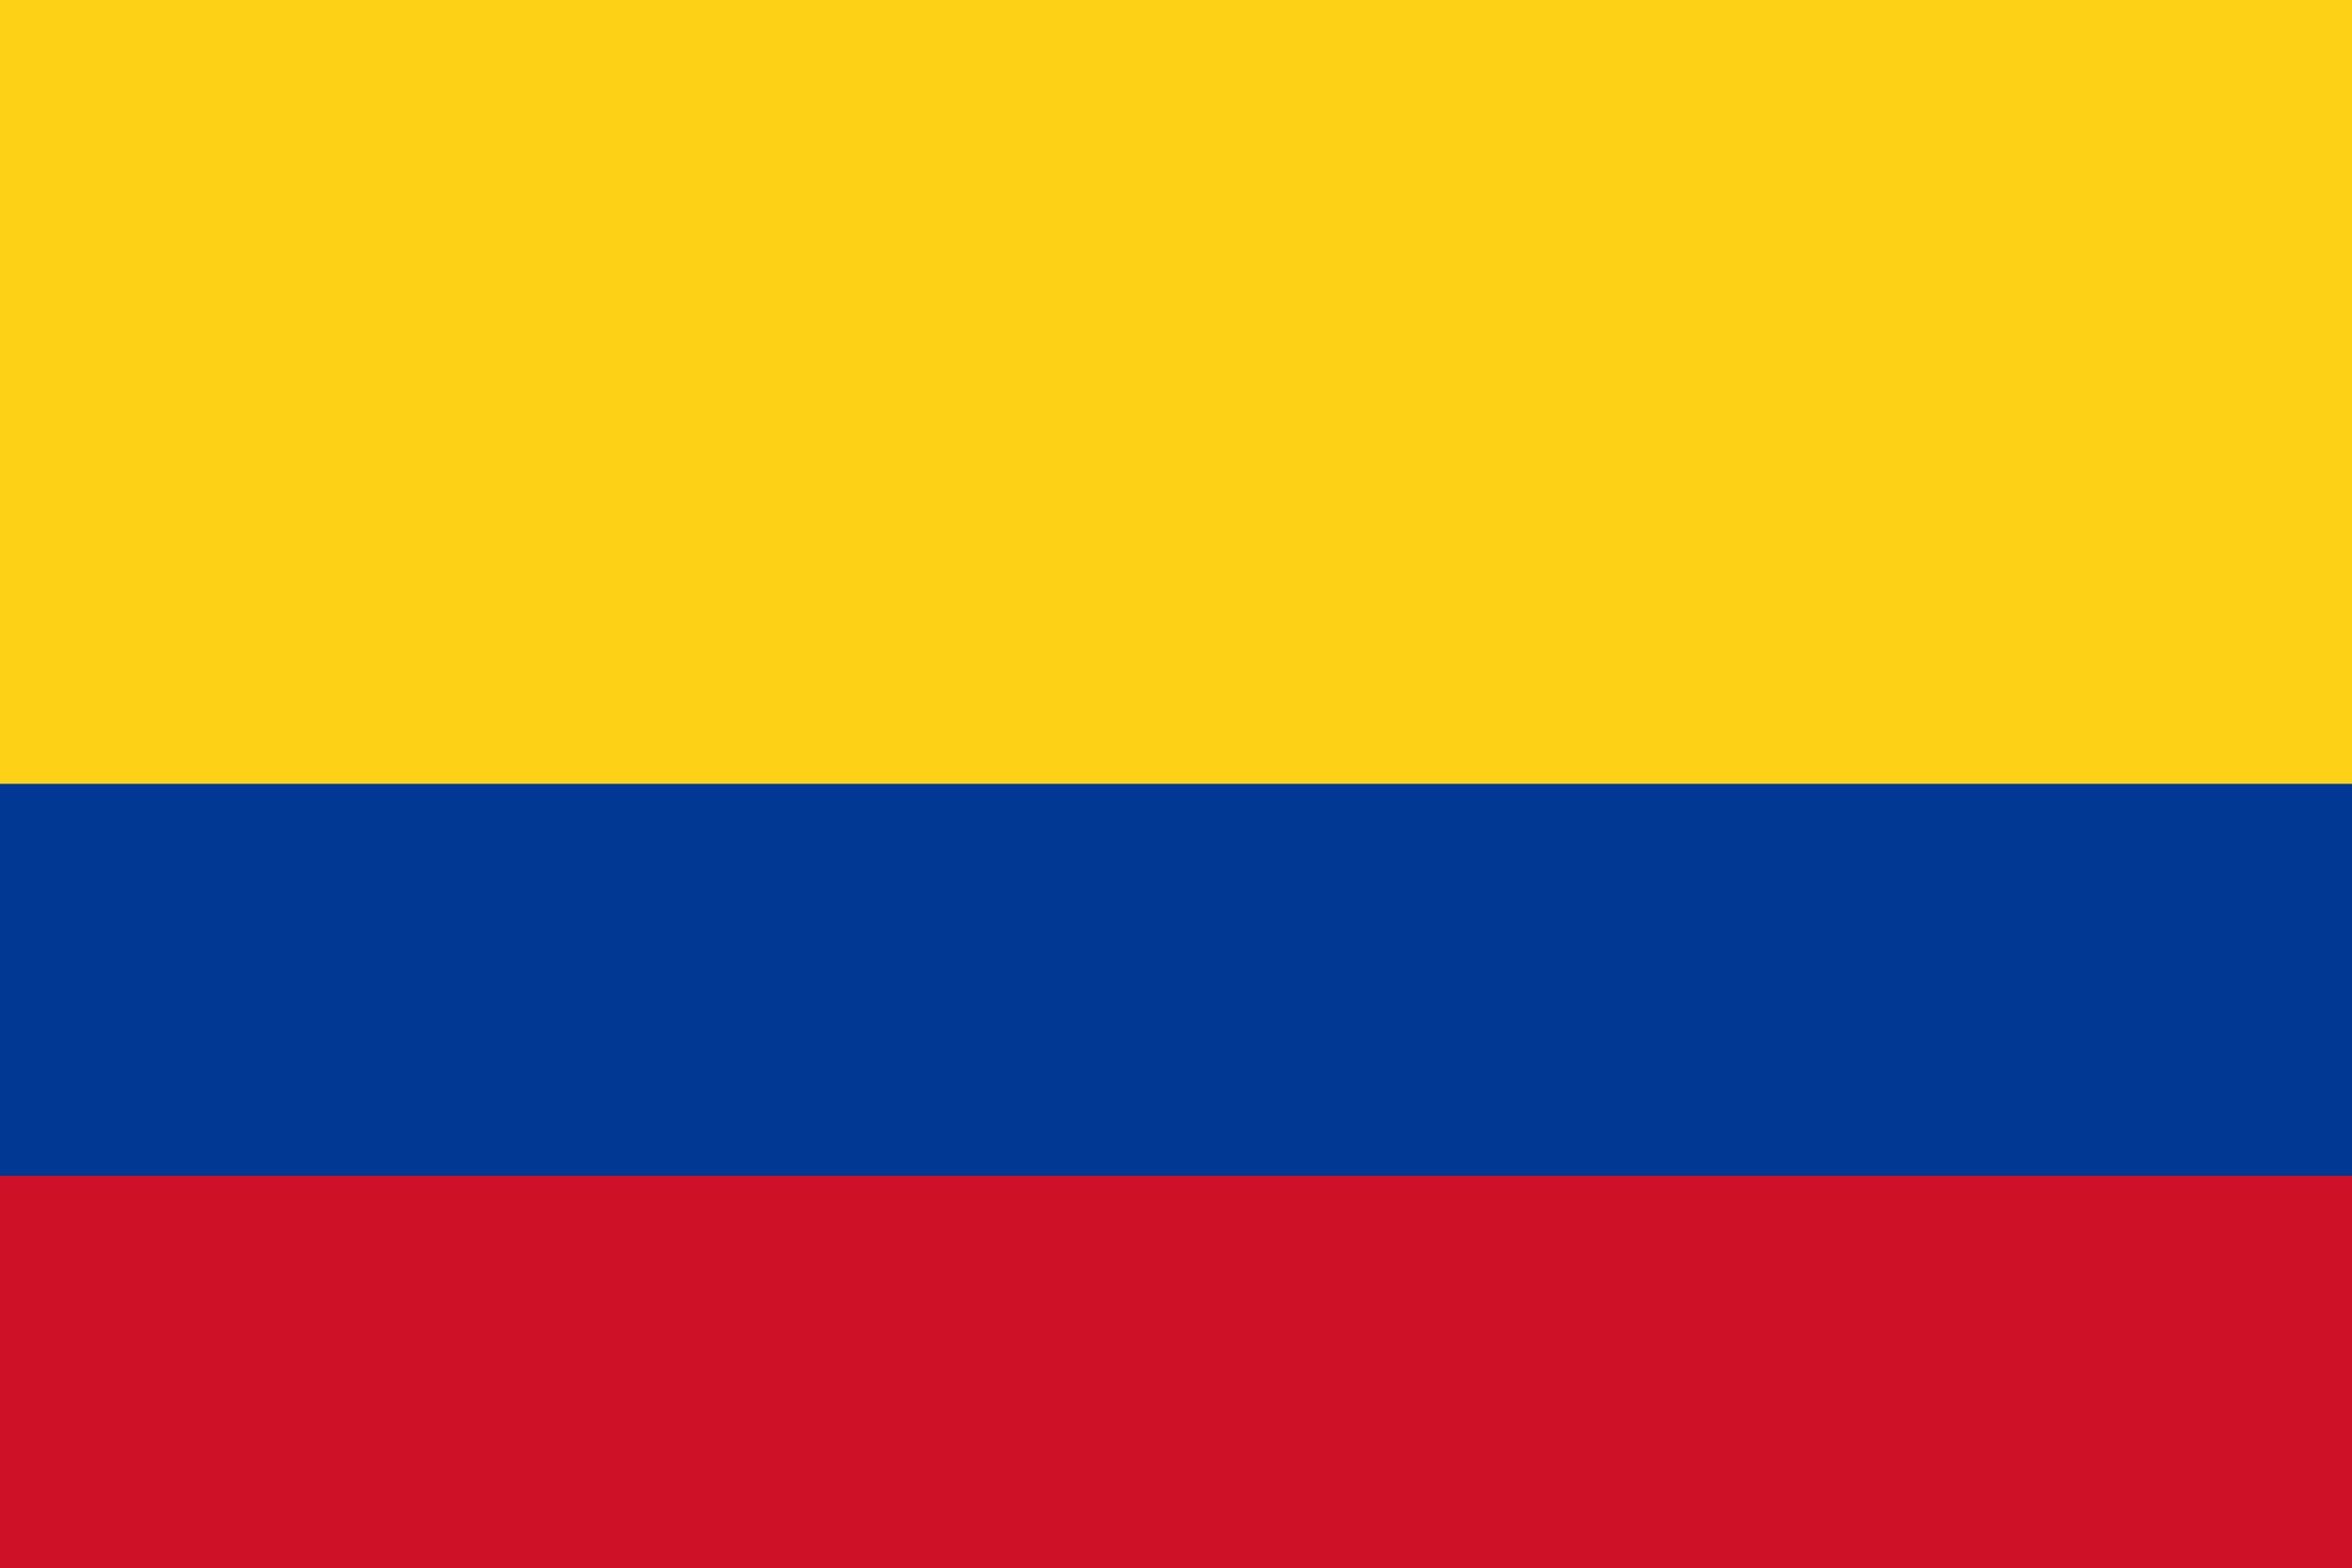 colombia, страна, Эмблема, логотип, символ - Обои HD - Профессор falken.com